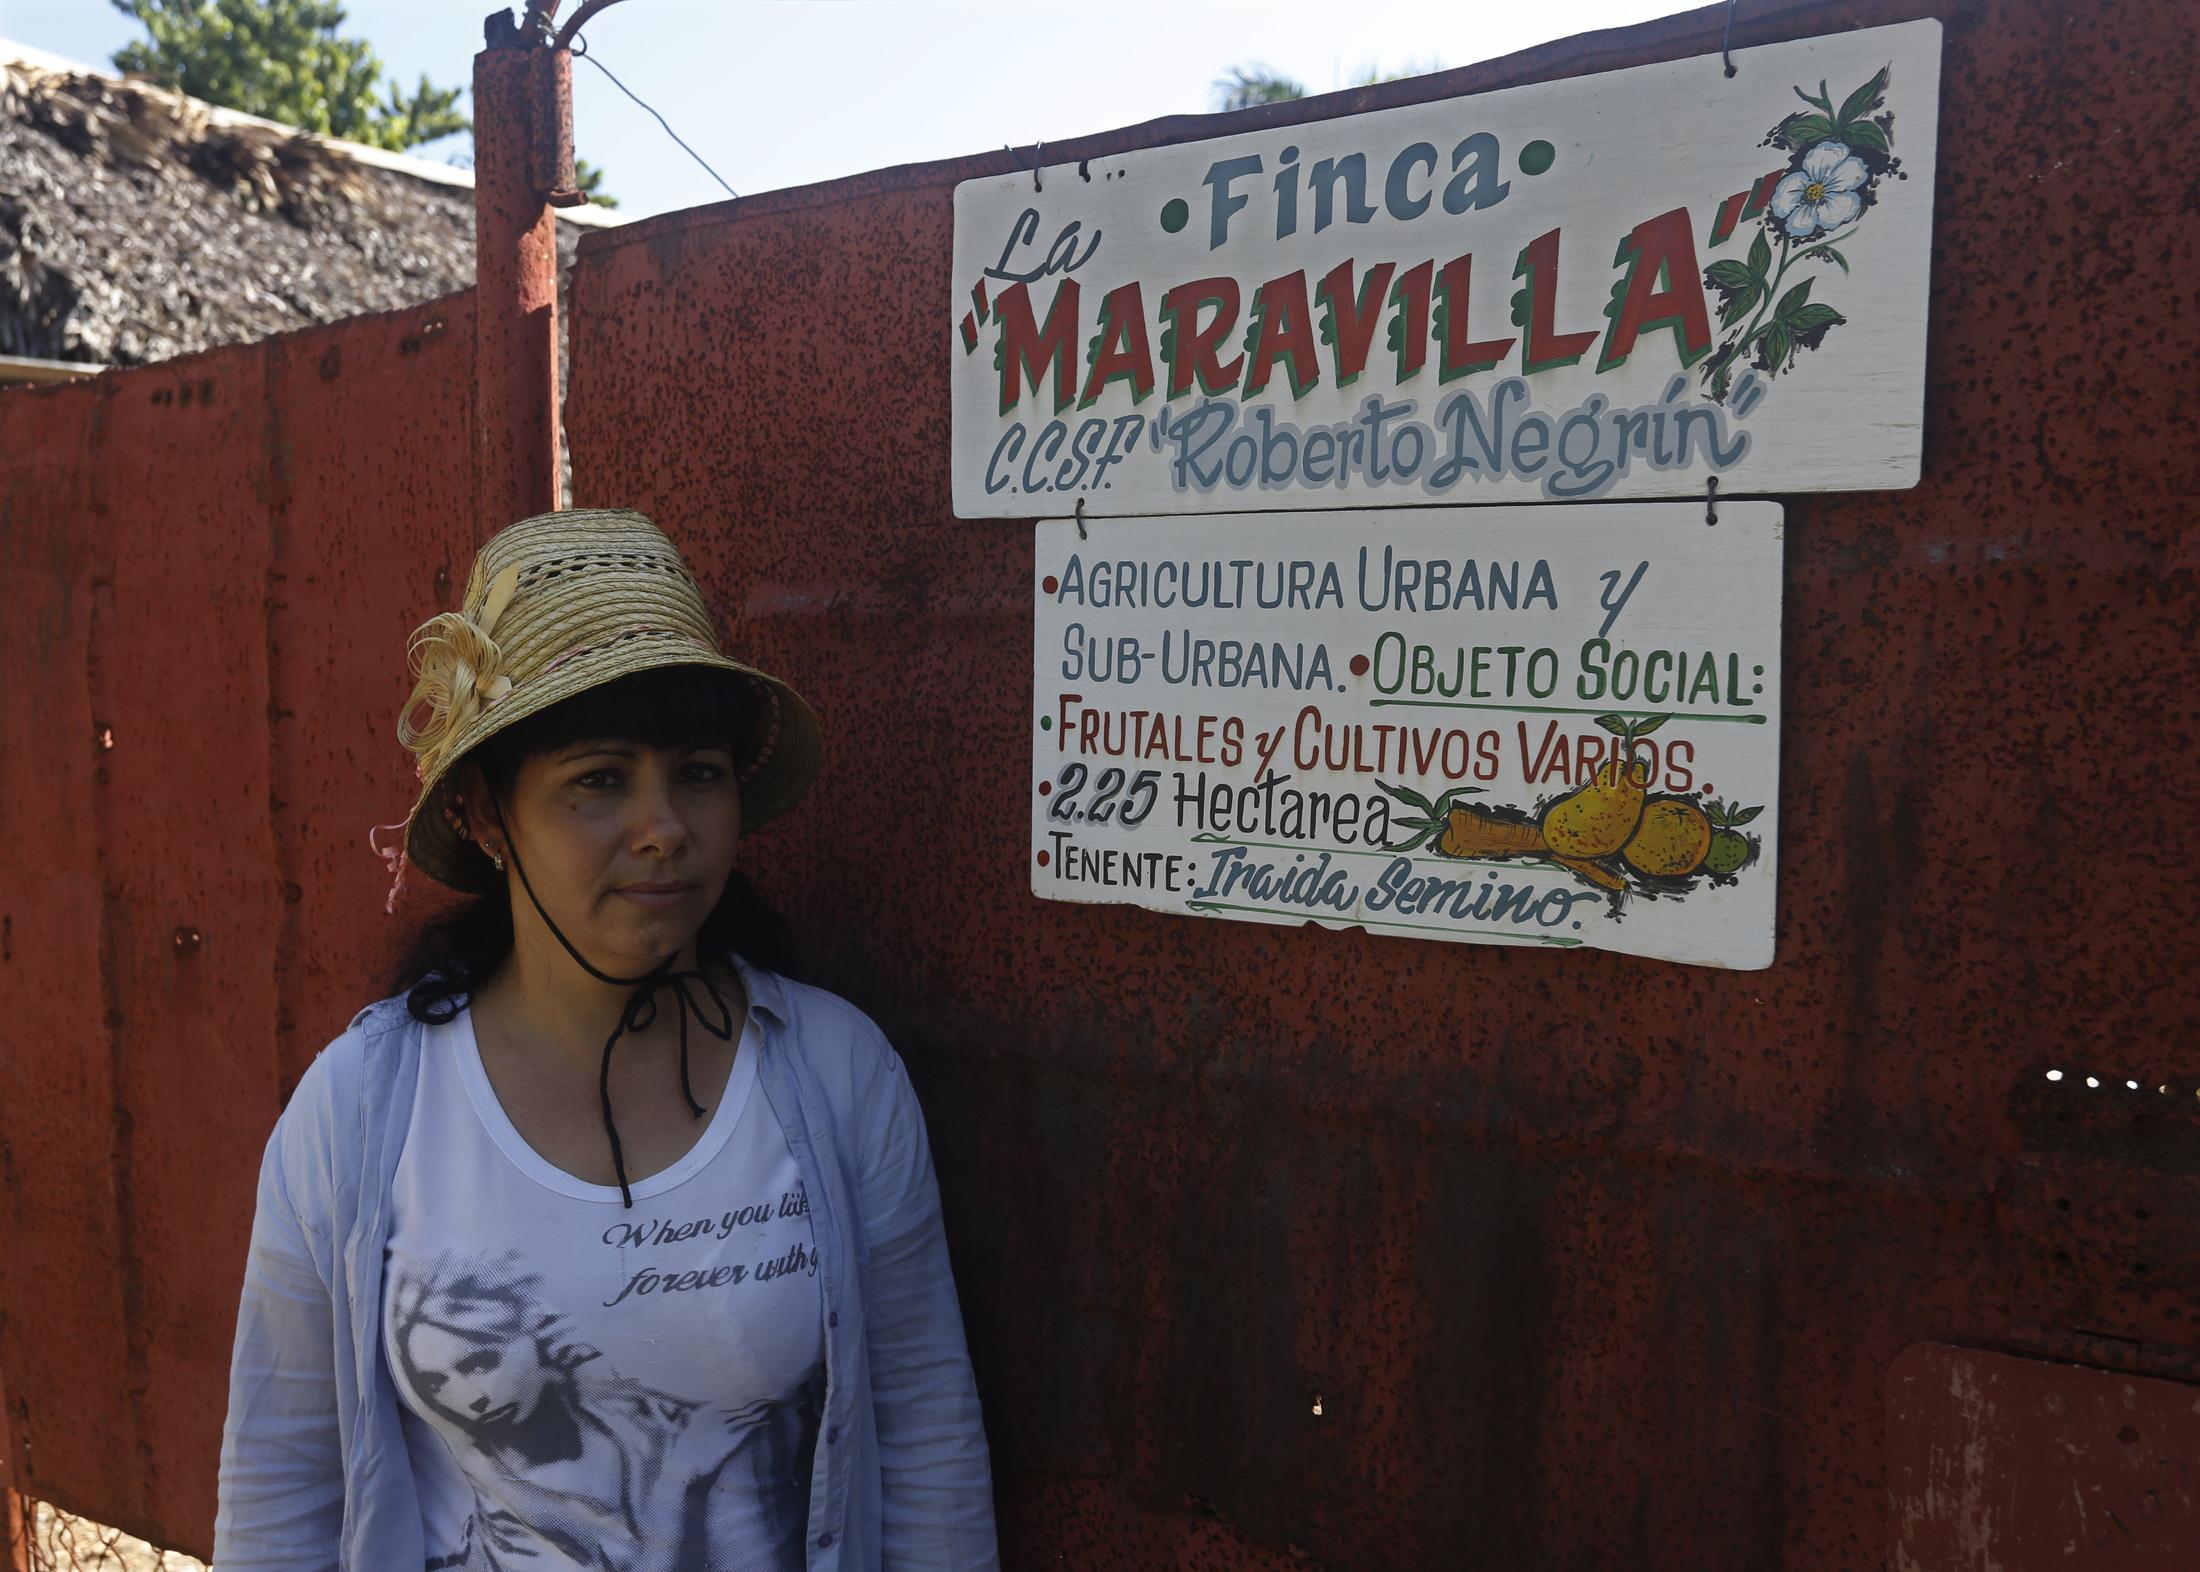 Iraida Semino Habana ondoko La Lisa herrian daukan hiri-etxaldearen atarian.